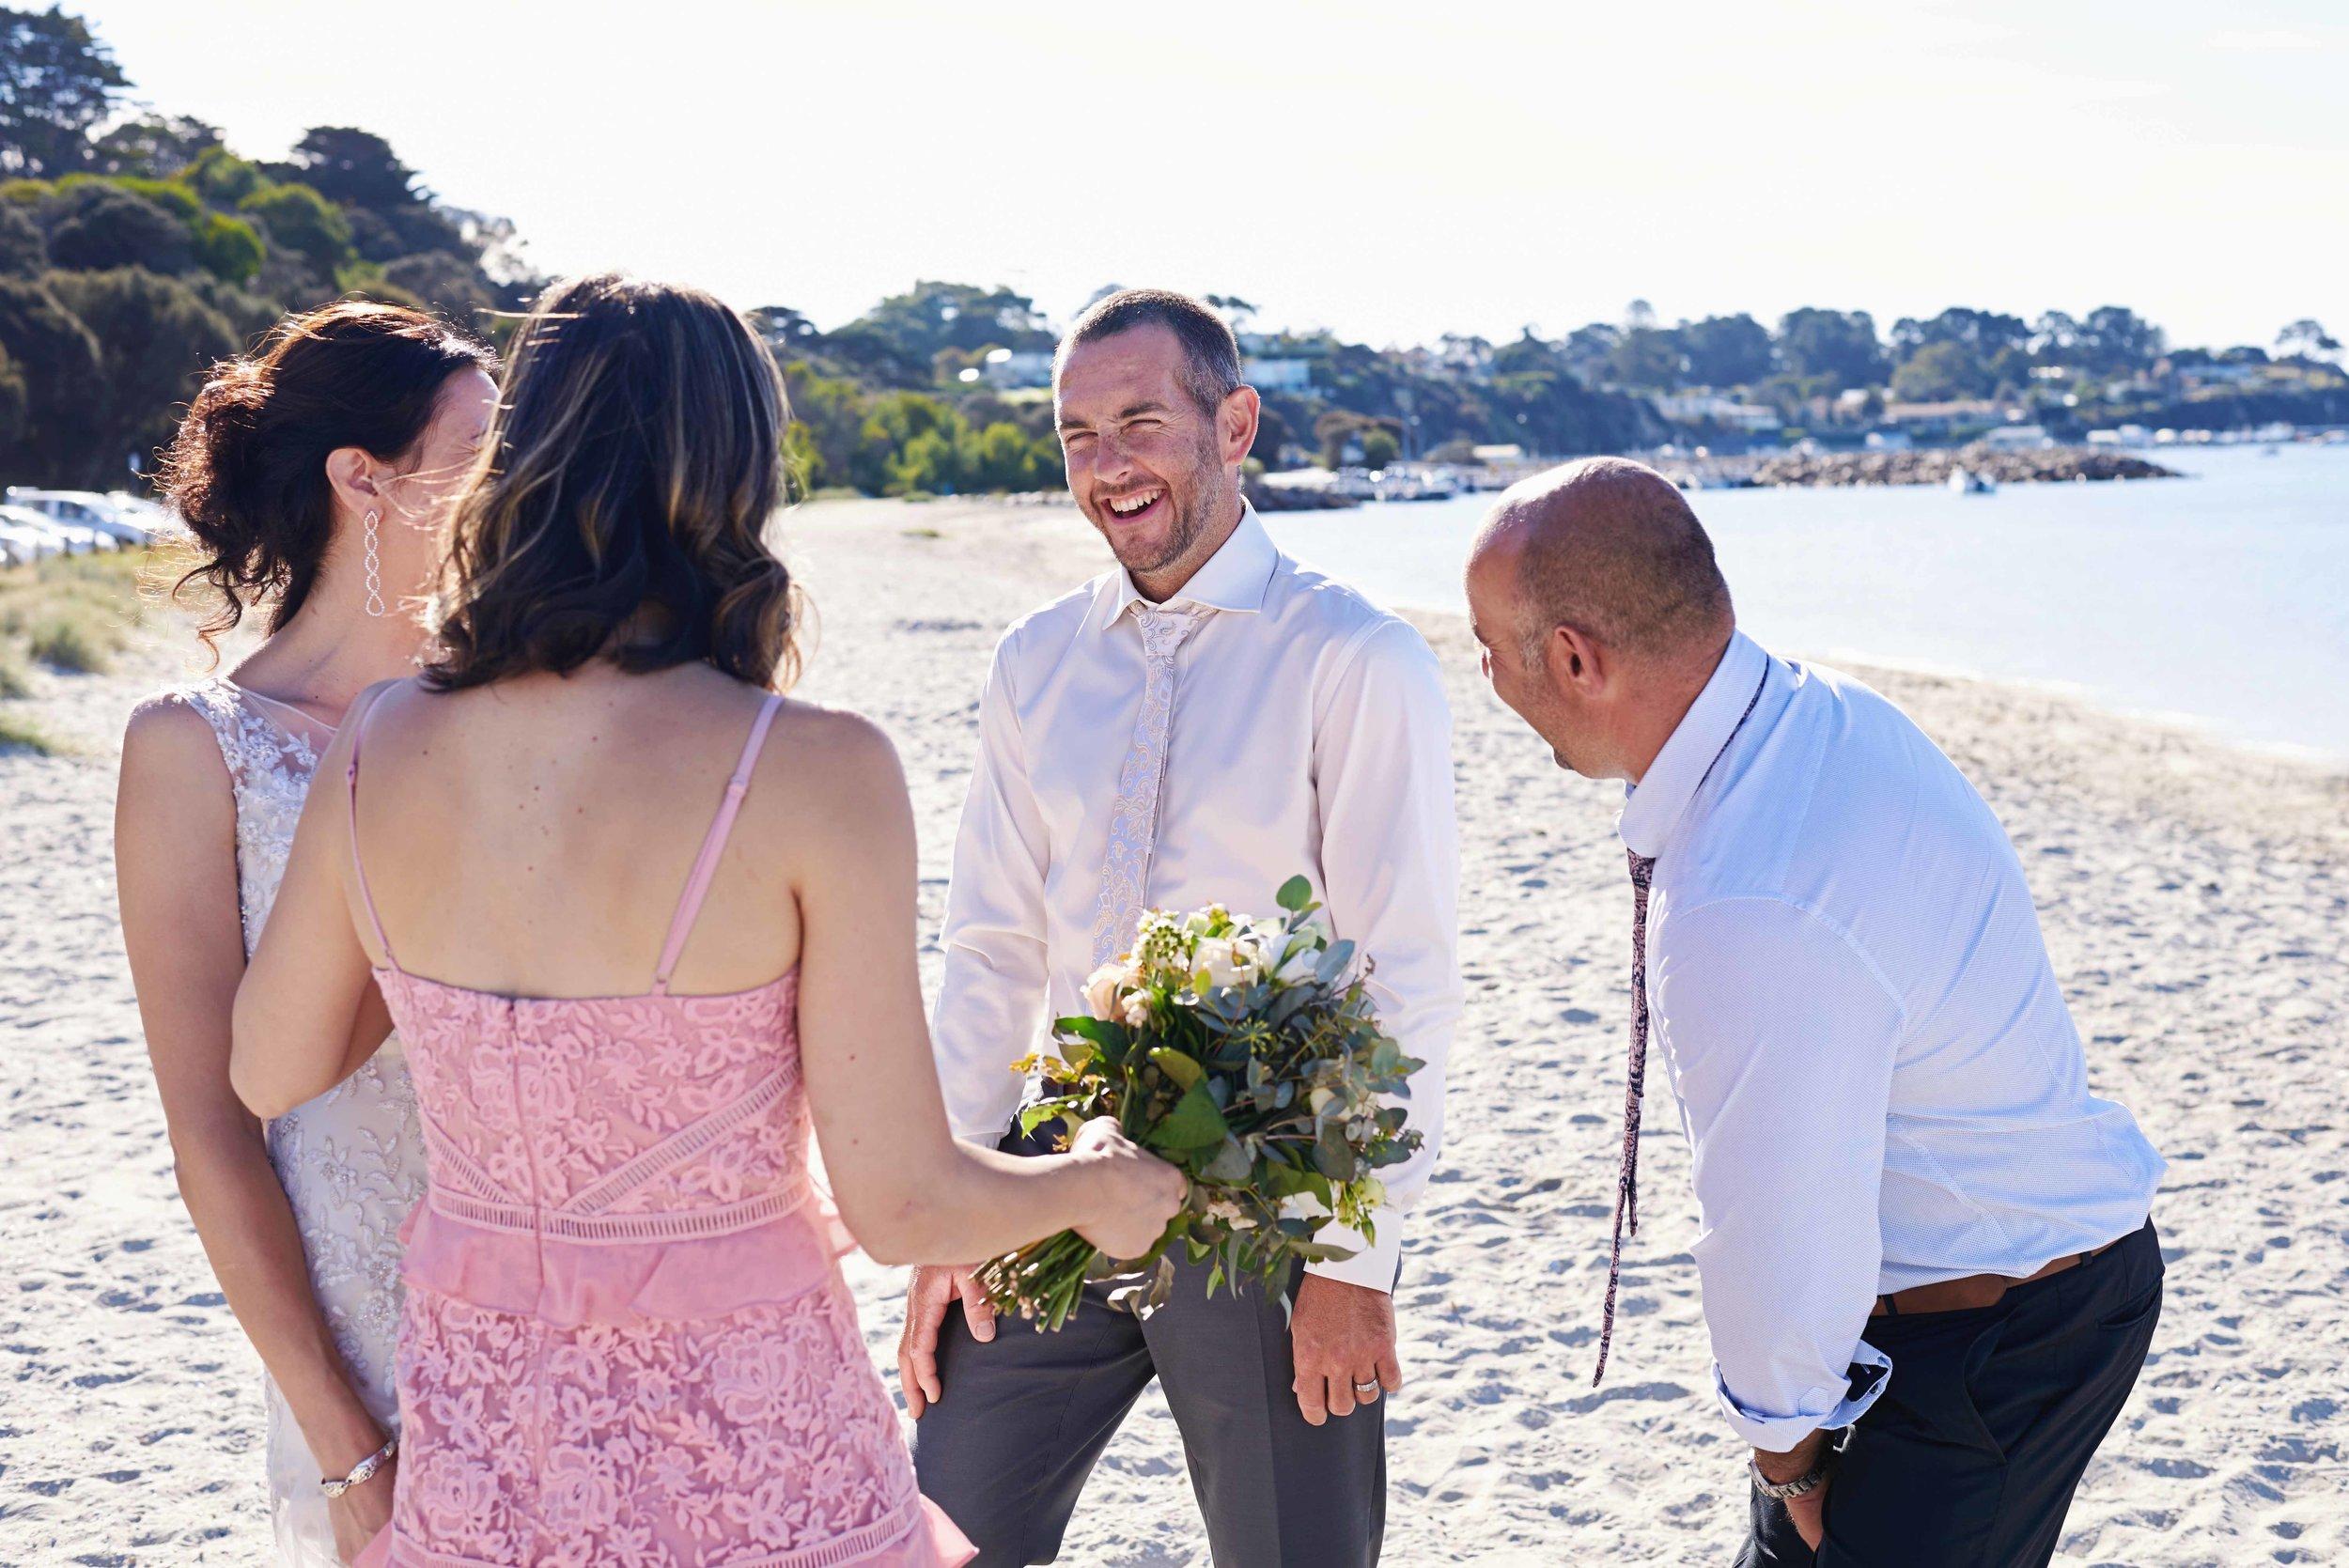 sorrento-wedding-photography-all-smiles-marissa-jade-photography-168.jpg